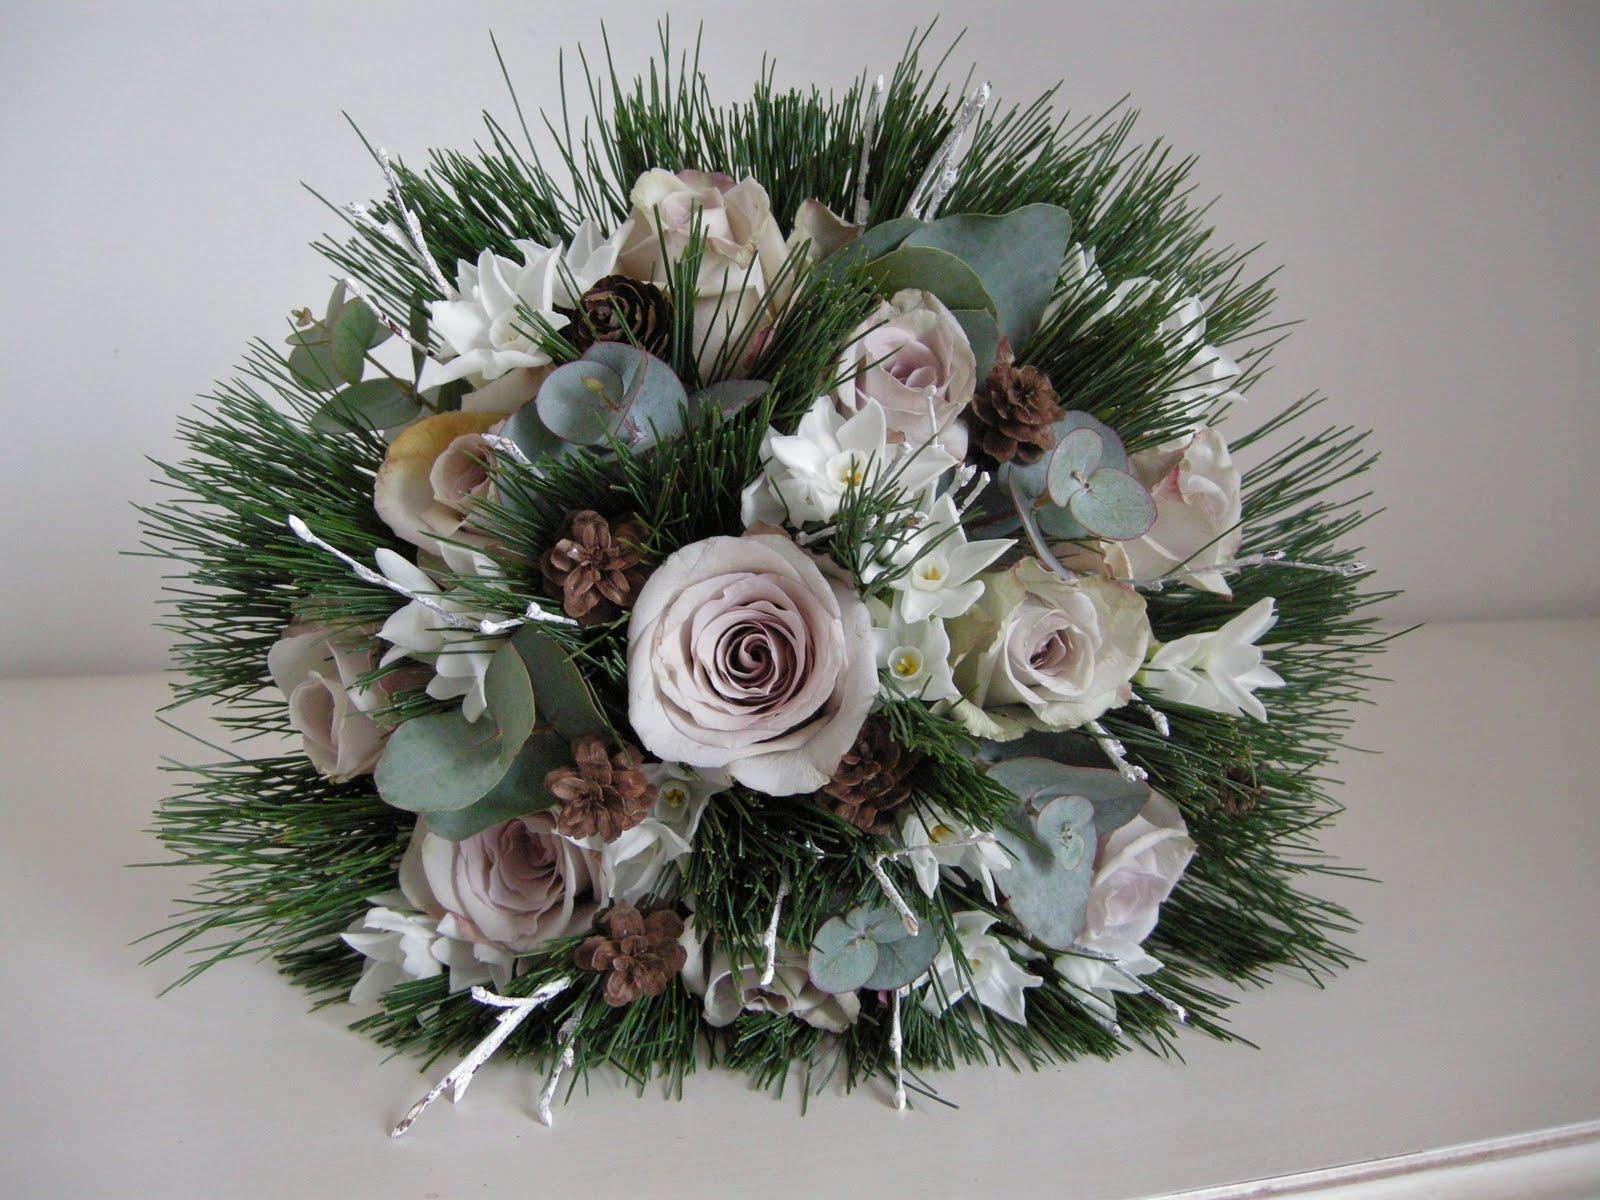 Wedding Flowers Blog: Winter Wedding Flowers